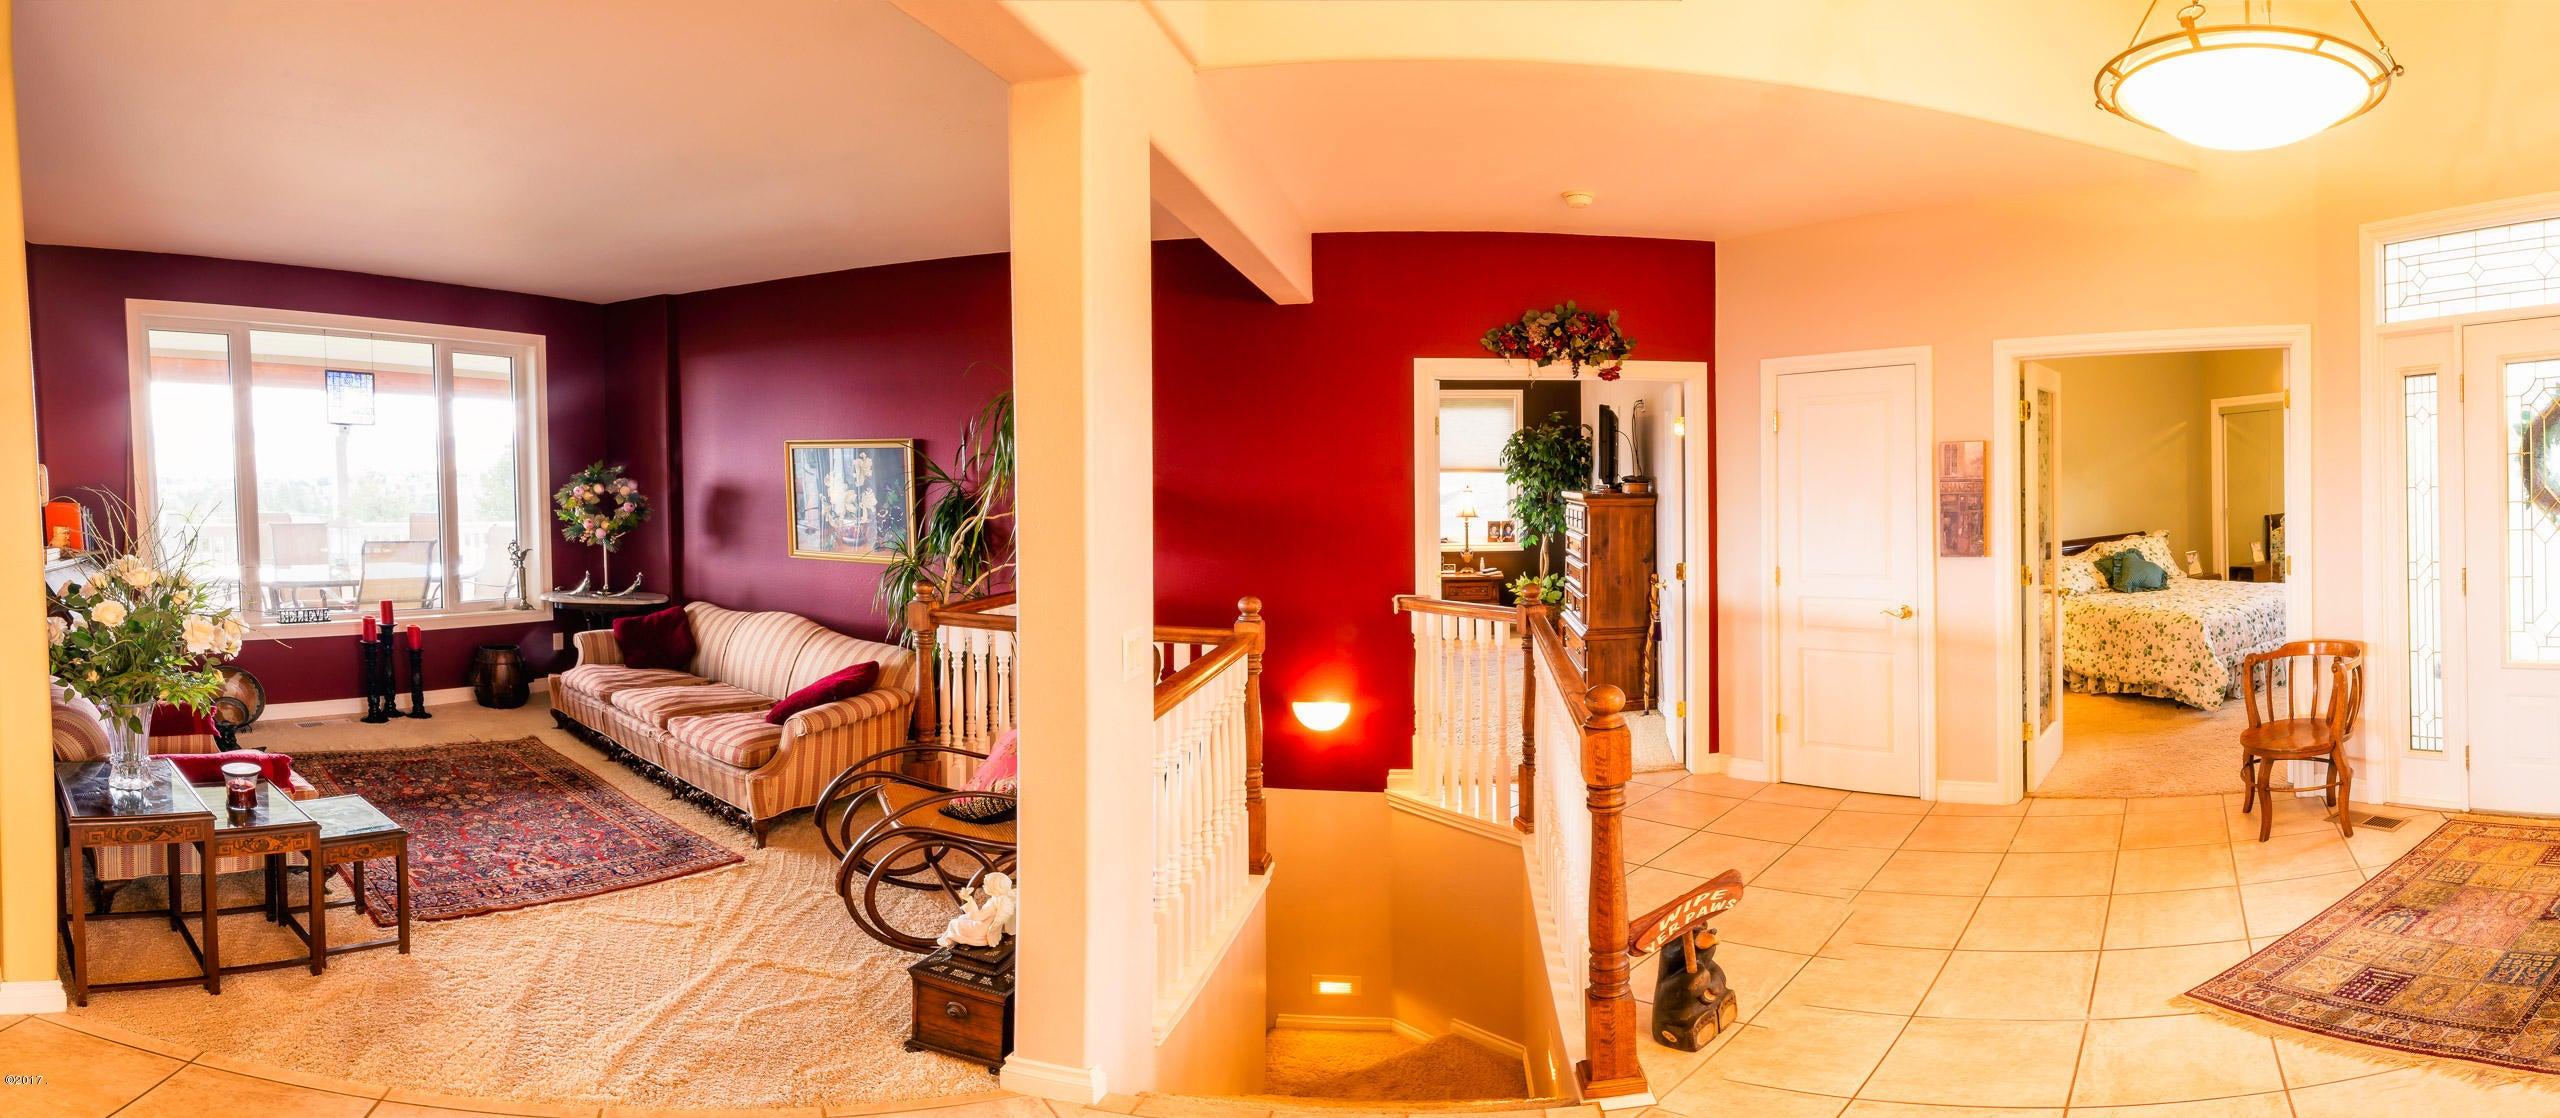 Additional photo for property listing at 7230 Stonehaven Avenue 7230 Stonehaven Avenue Missoula, Montana 59803 United States